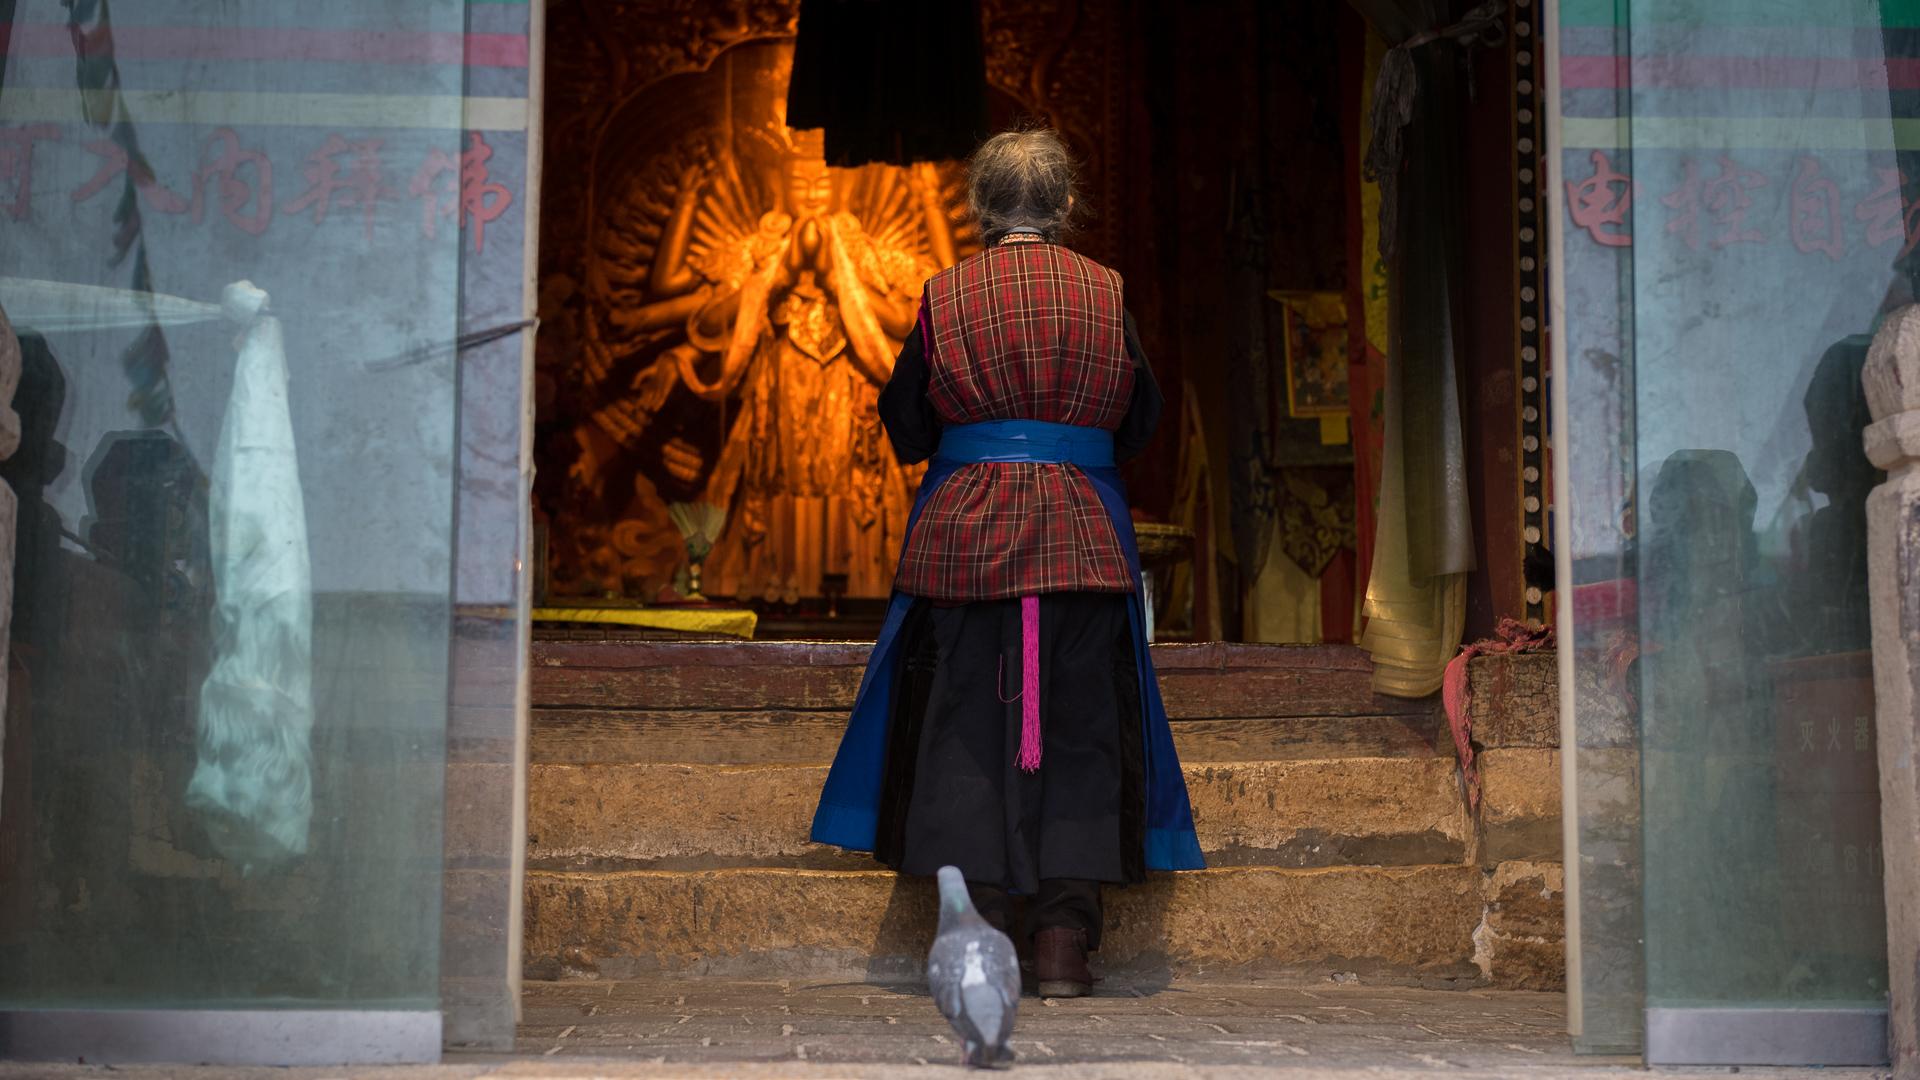 A Tibetan woman prays in a Buddhist temple.